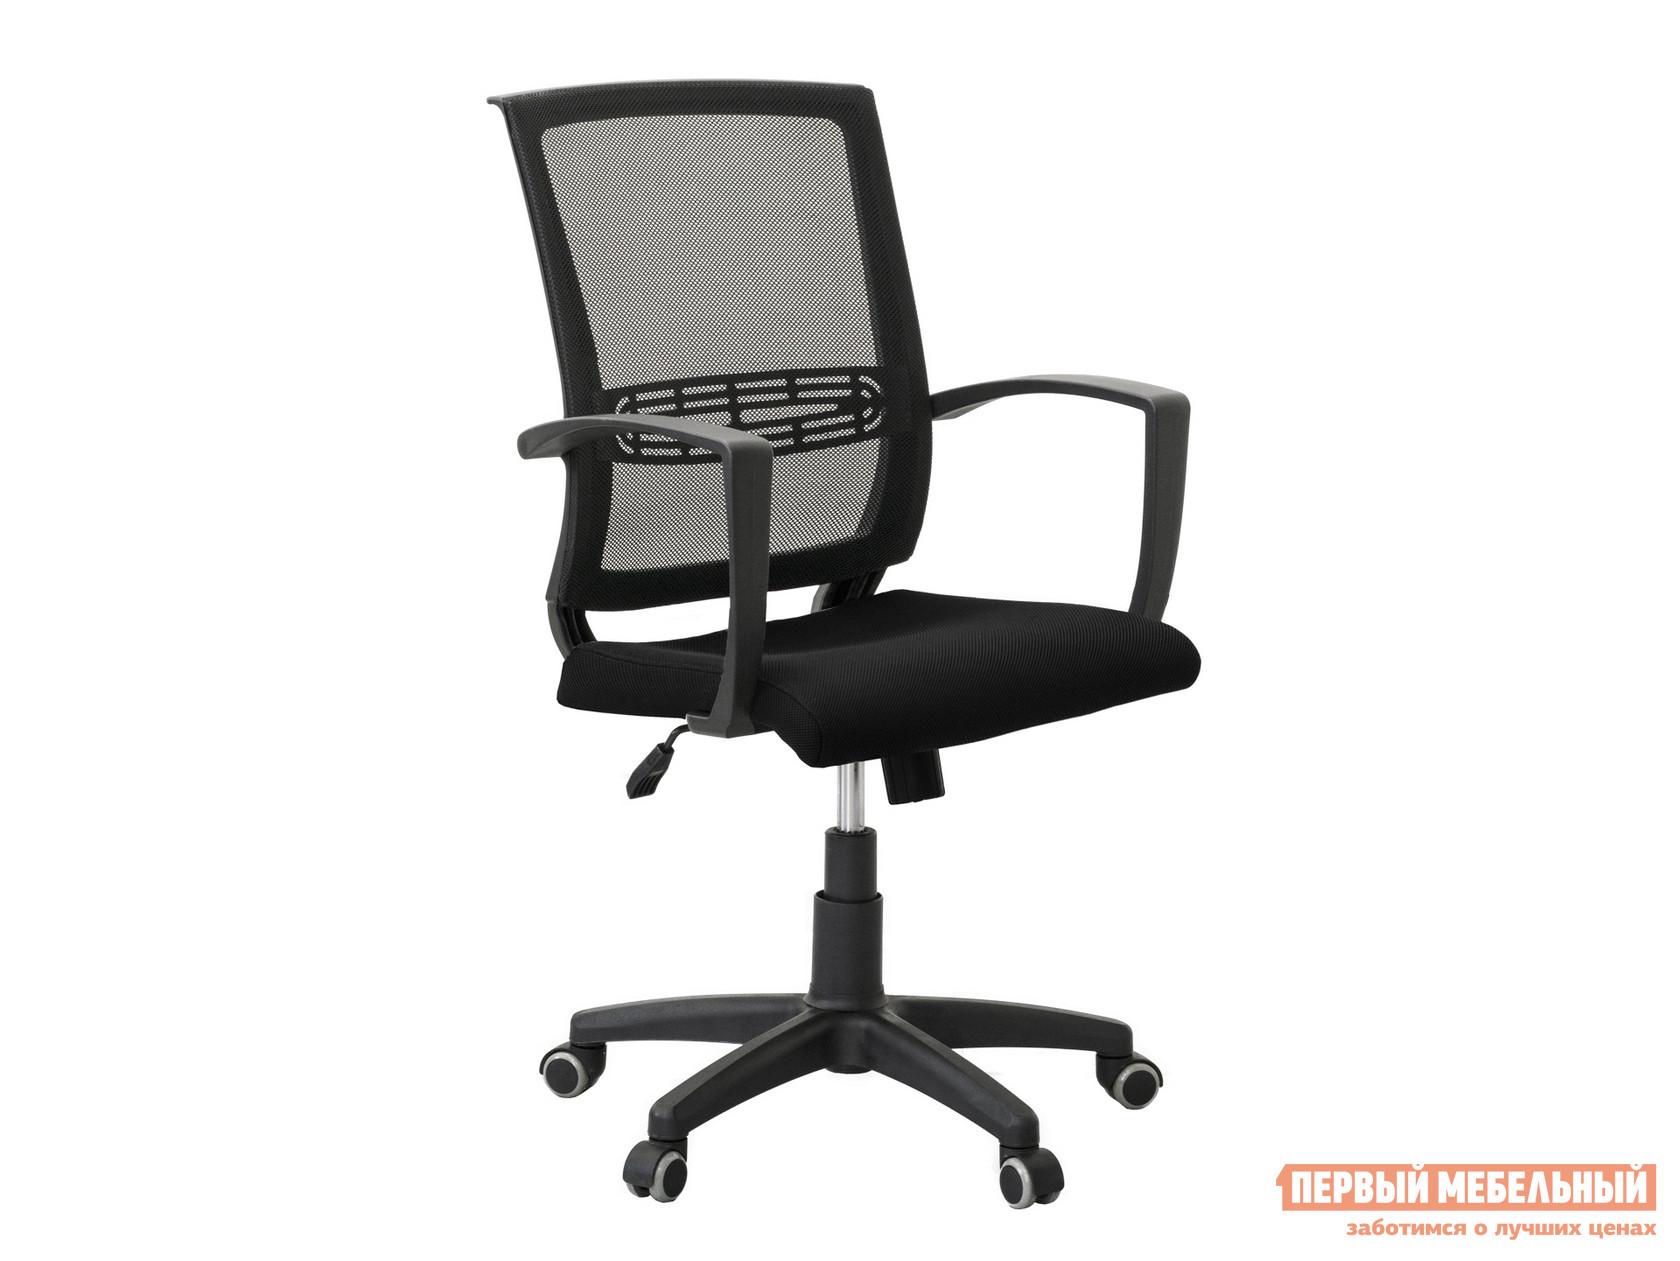 Офисное кресло Pointex iQ A кресло a prosperous furniture